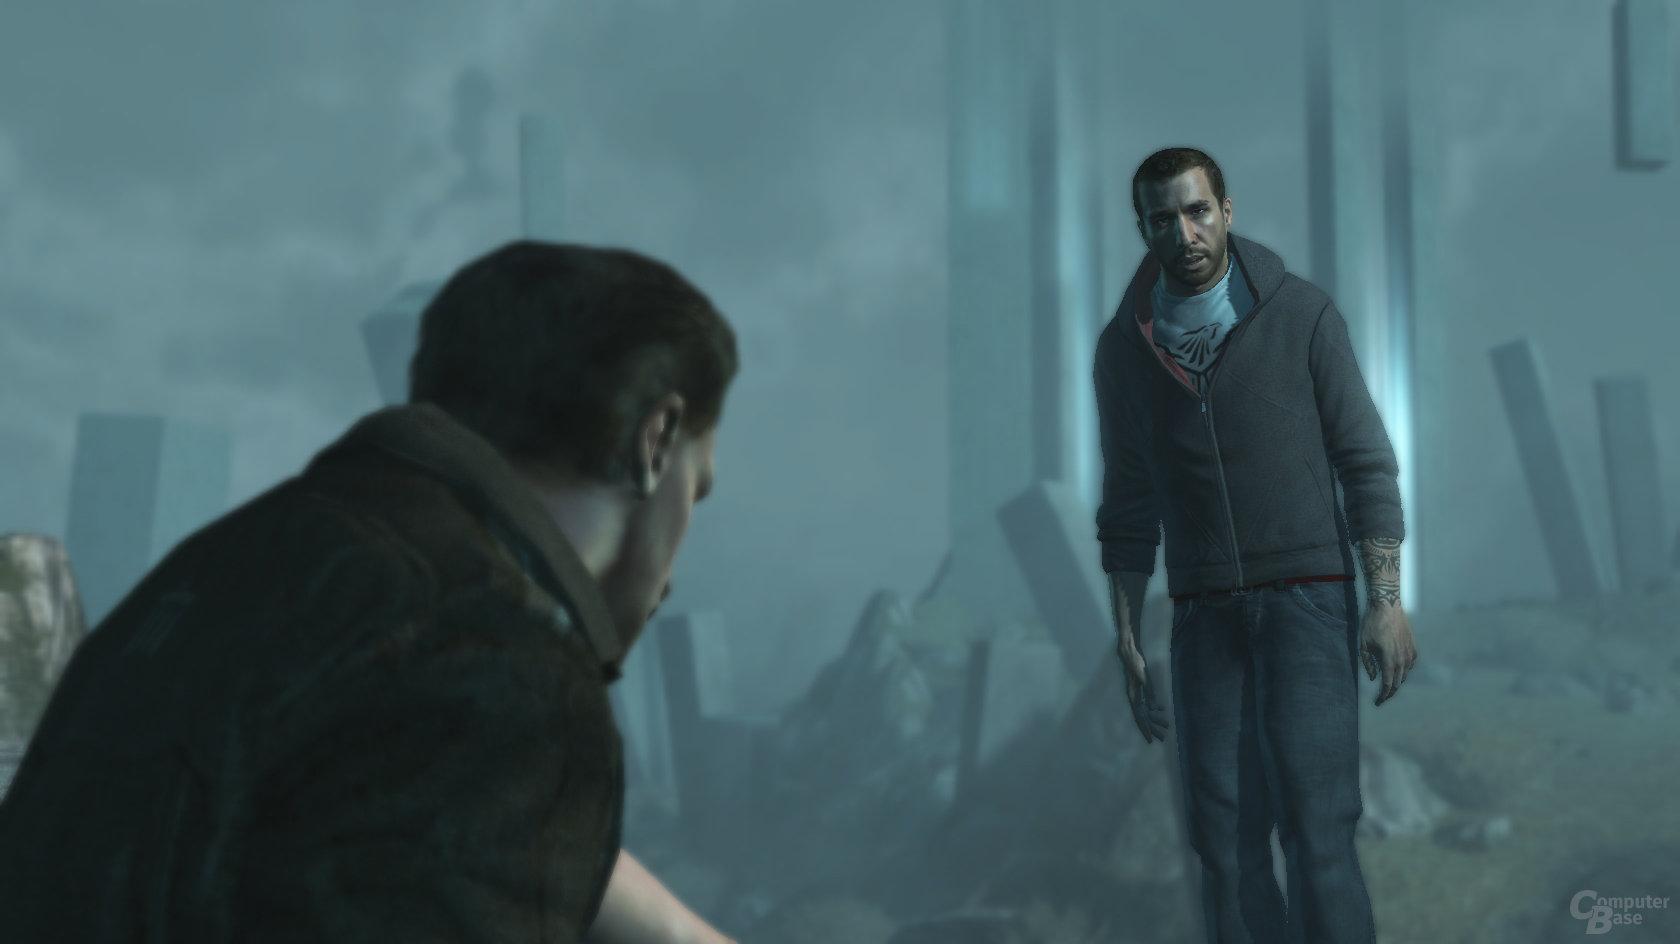 Assassin's Creed: Revelations: Alter neuer Held? Desmond im Animus